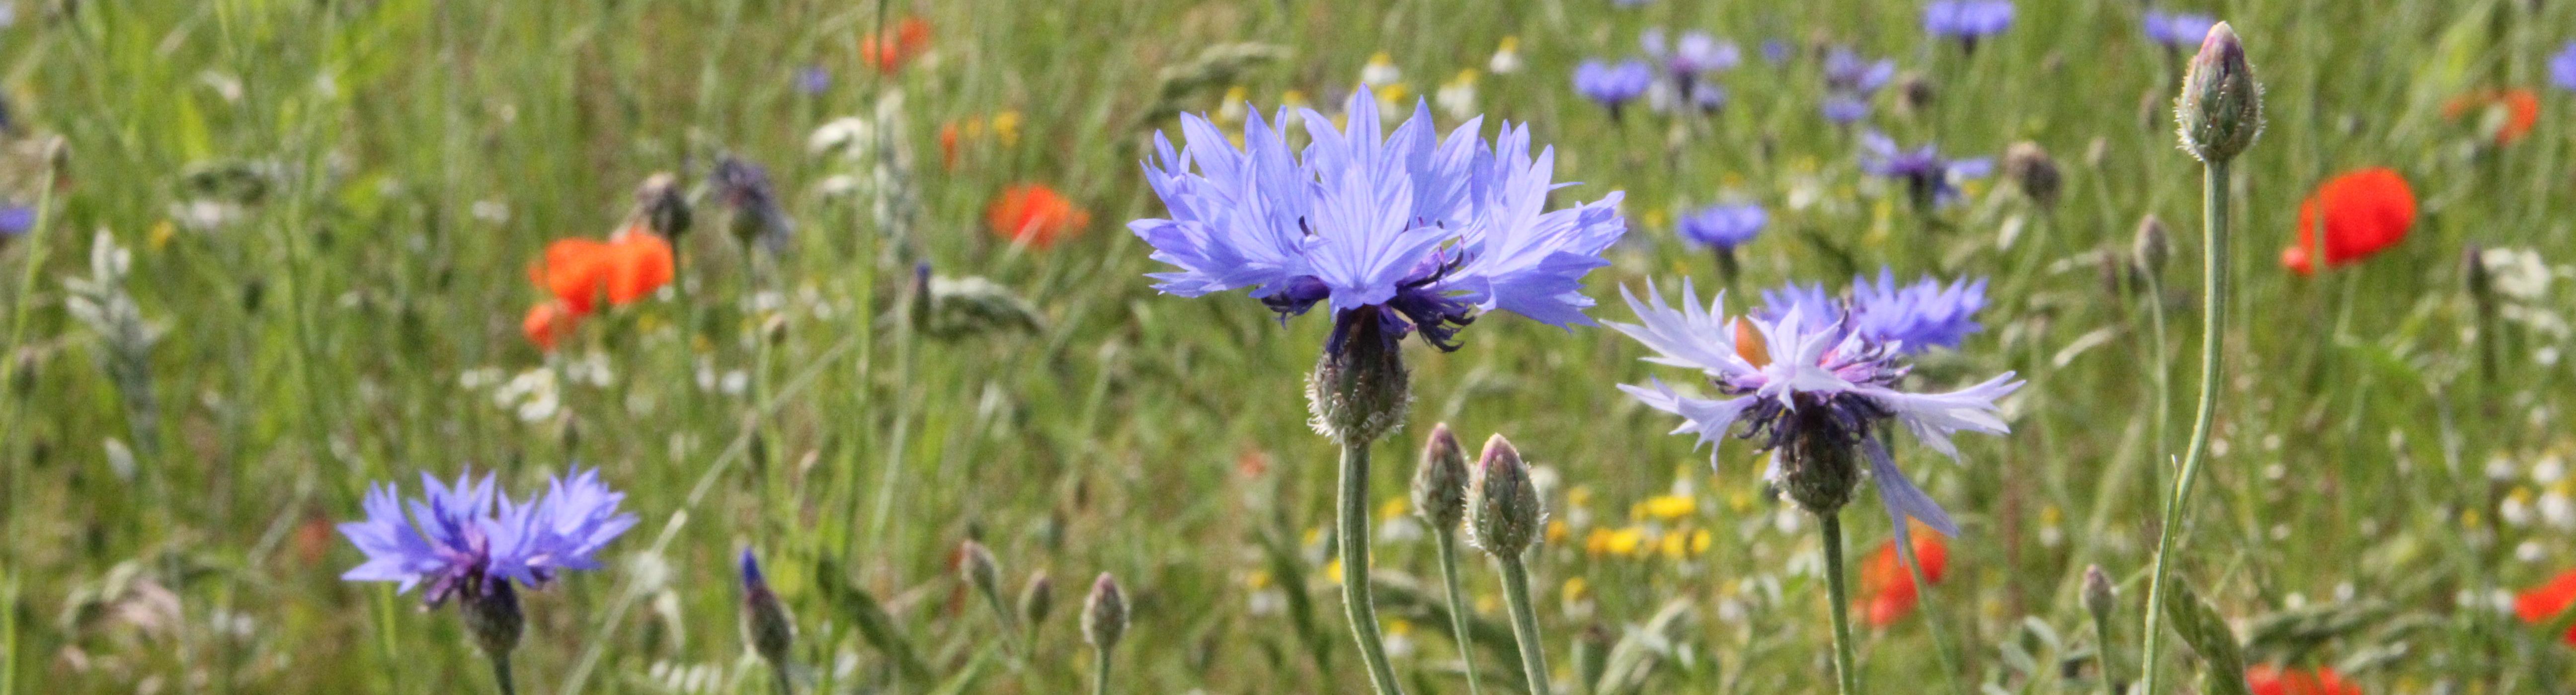 wildpflanzen bluehstreifen regio-saatgut